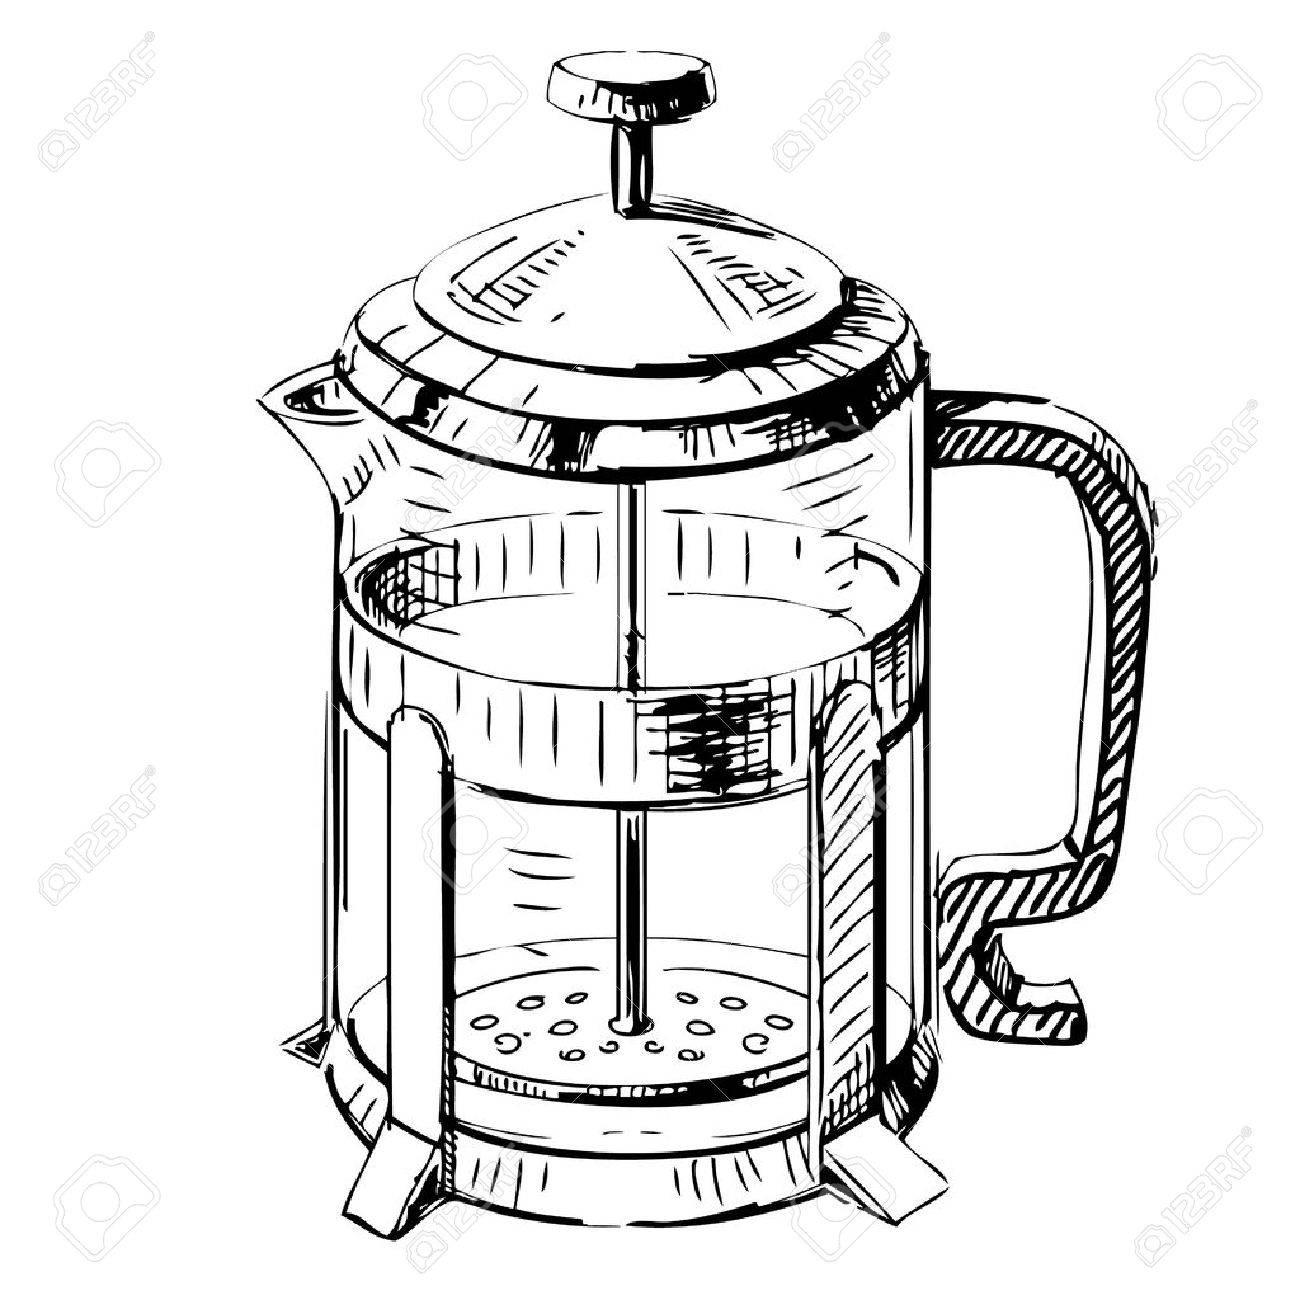 French press tea pot Stock Vector - 18010719